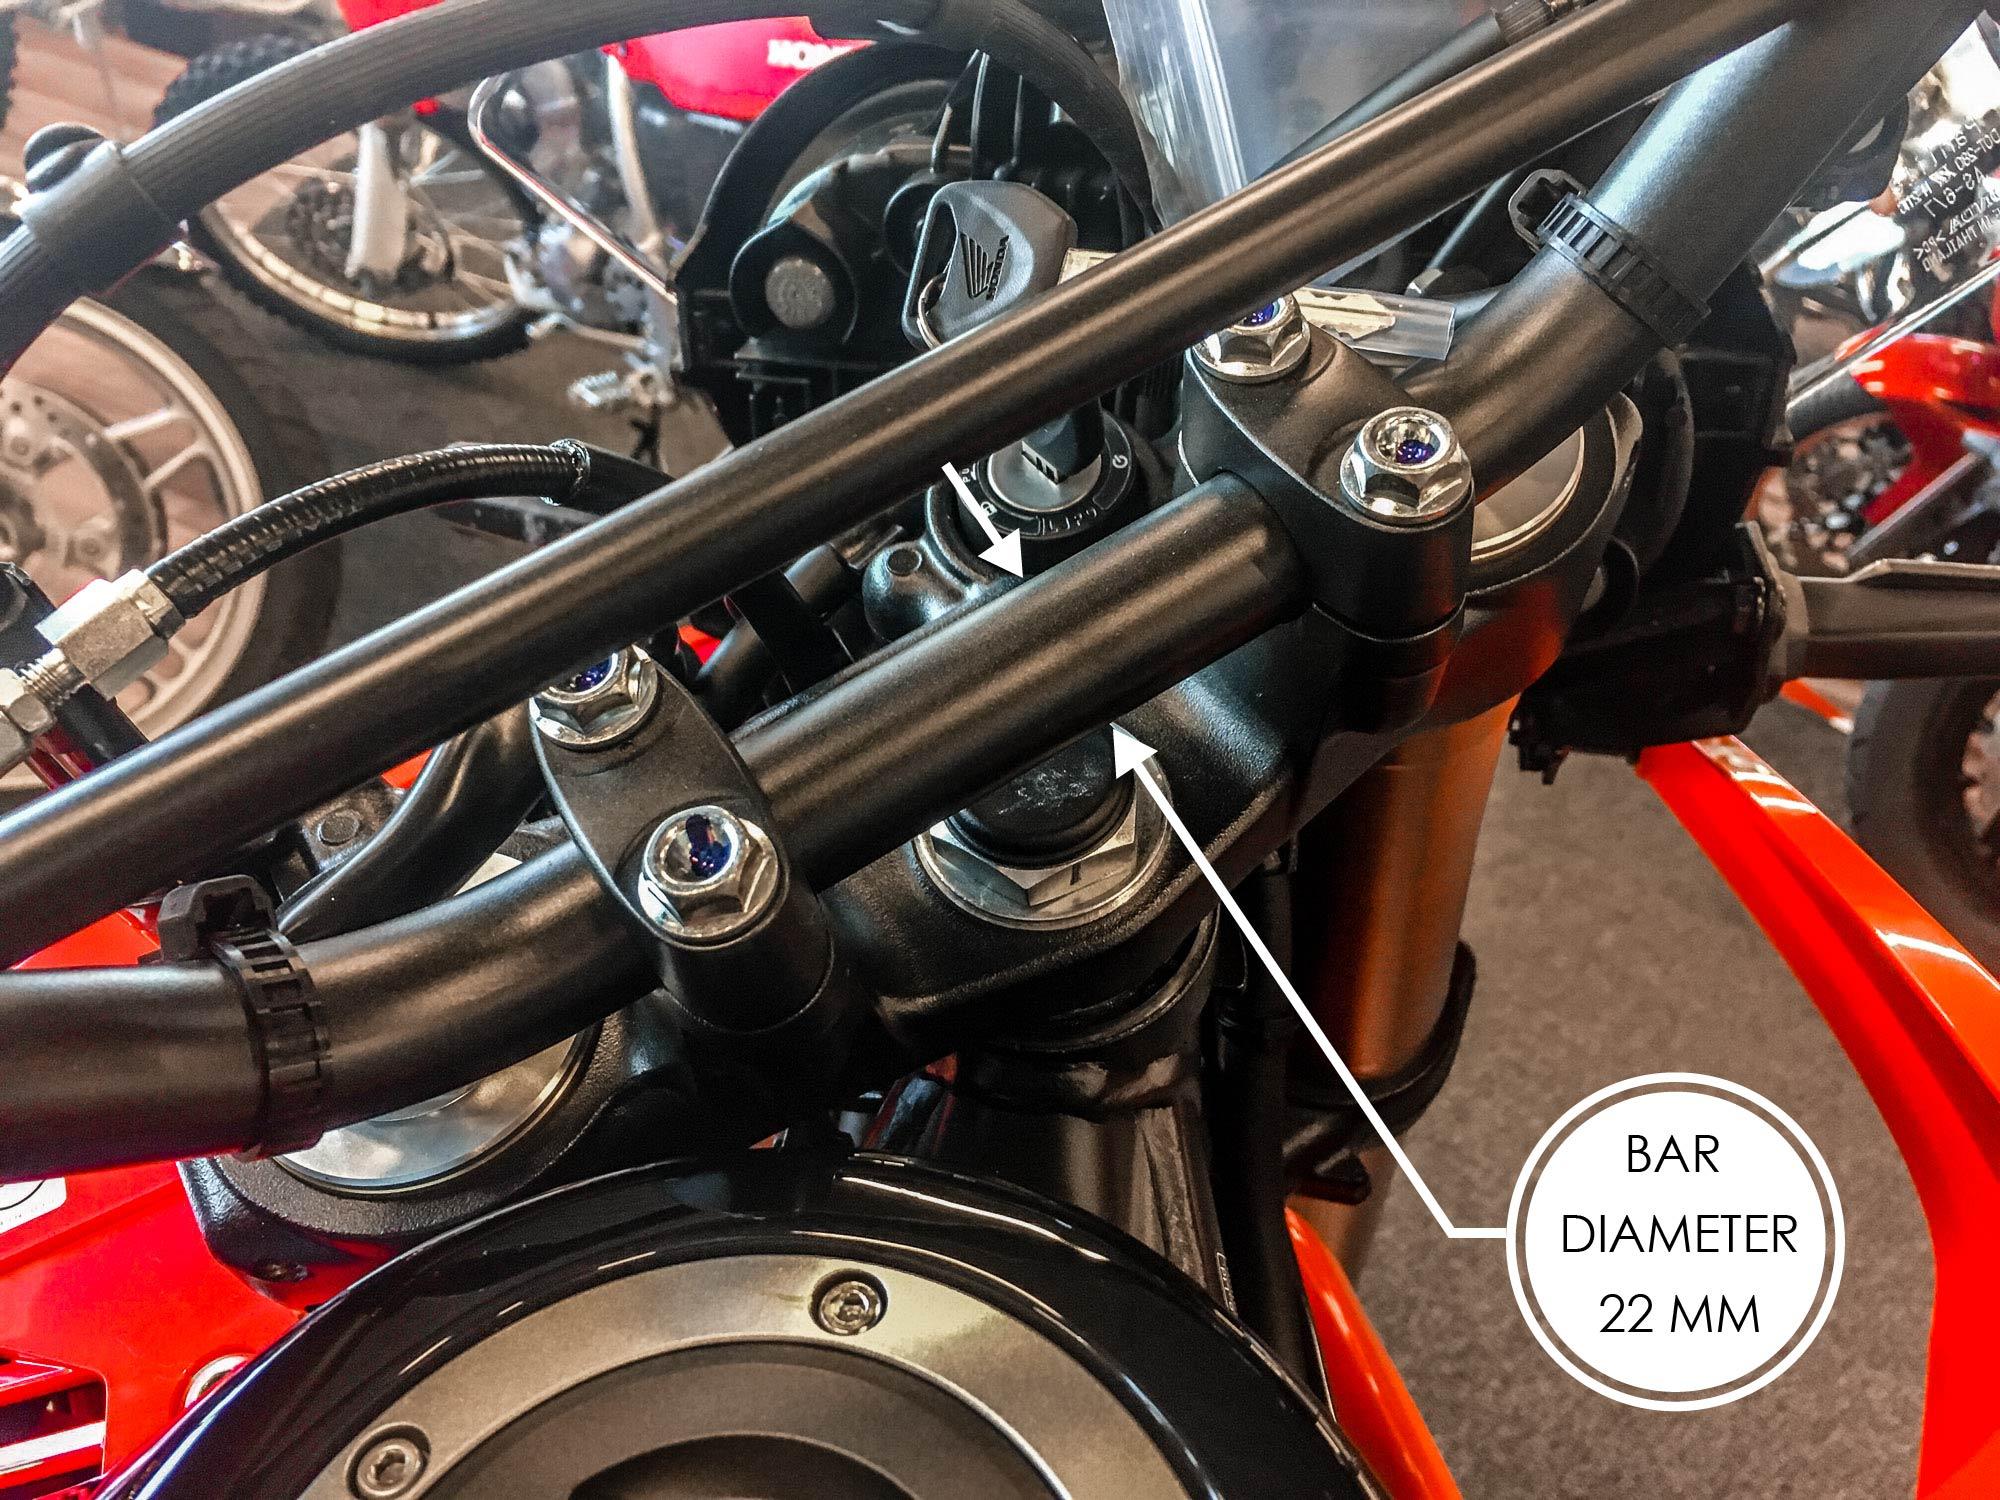 Honda CRF 250 Rally handle bar diameter